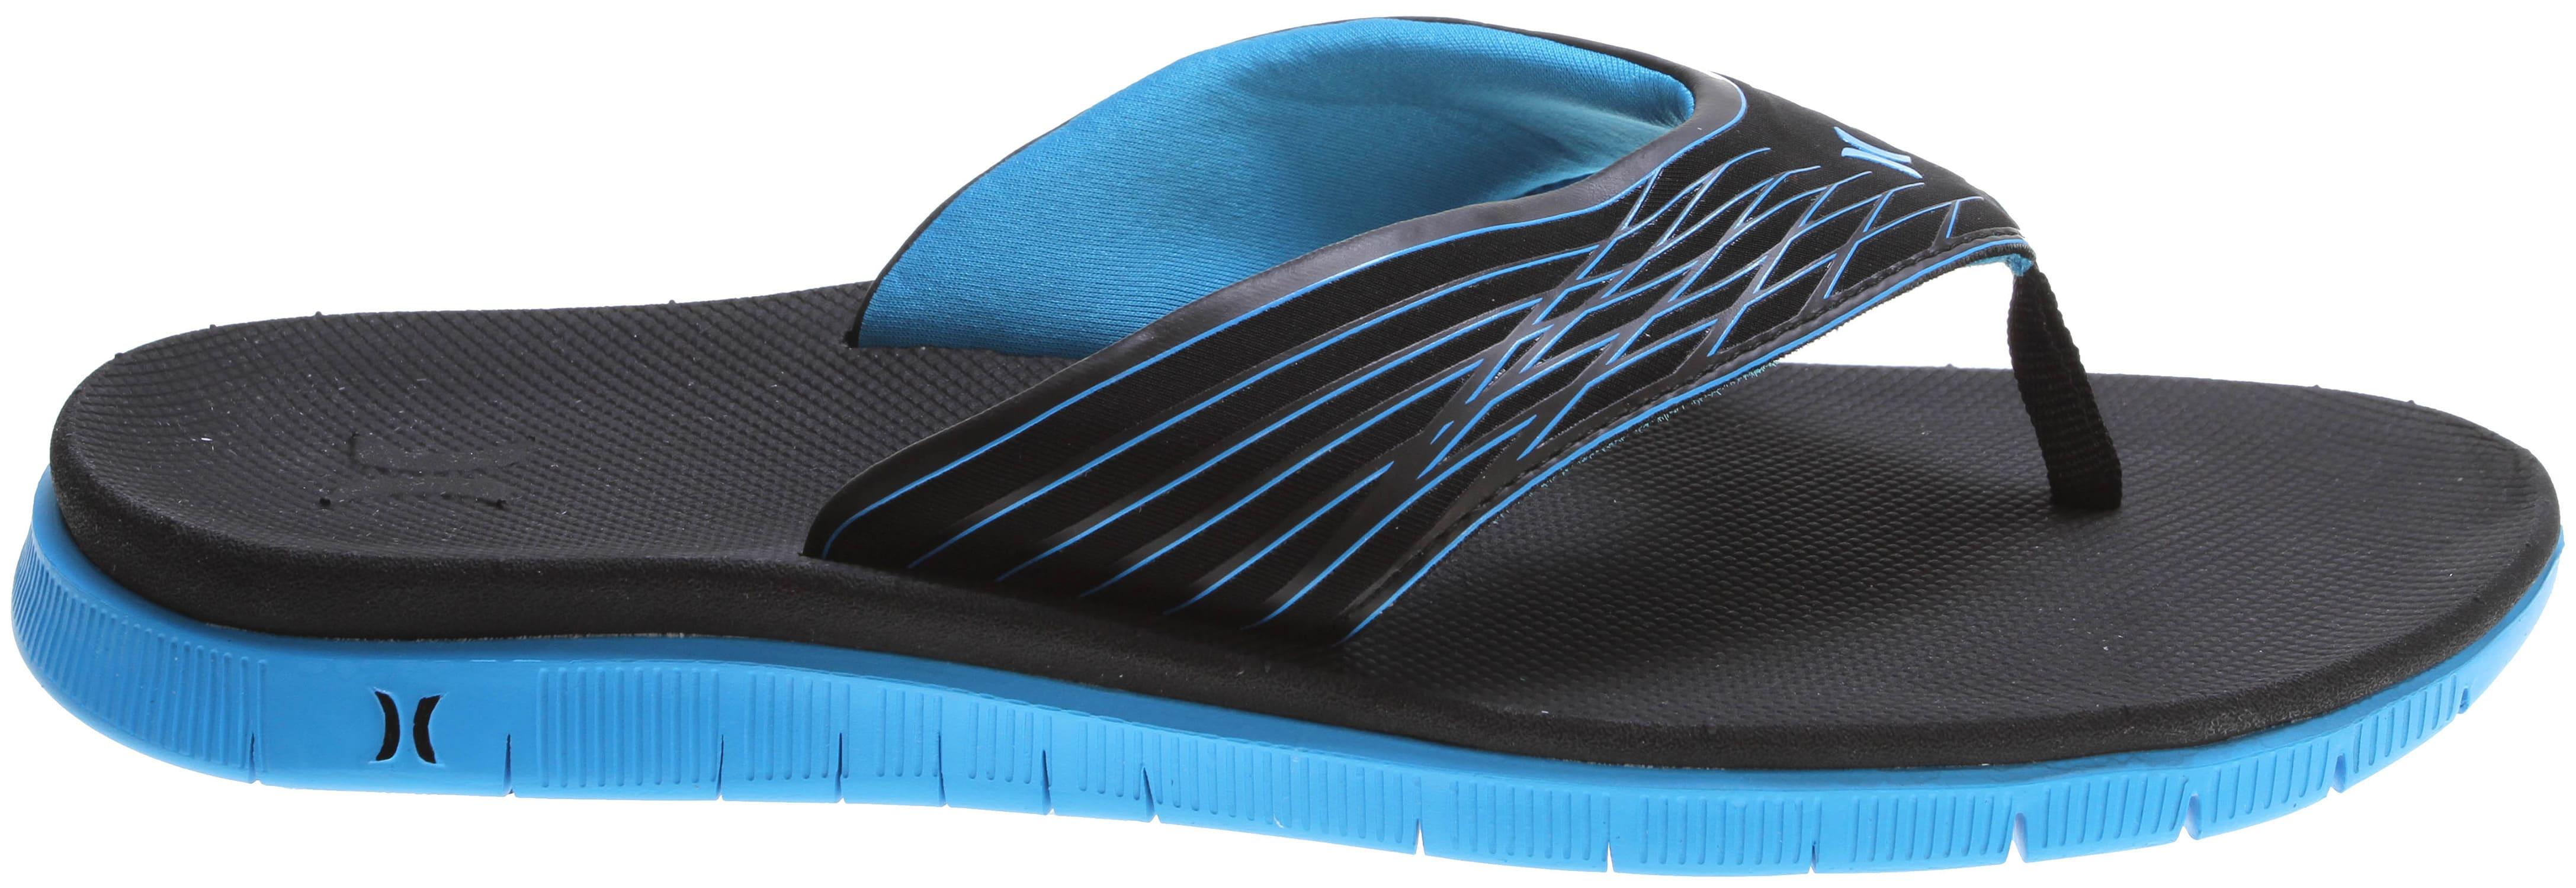 0410fcedb Hurley Phantom Sandals - thumbnail 1